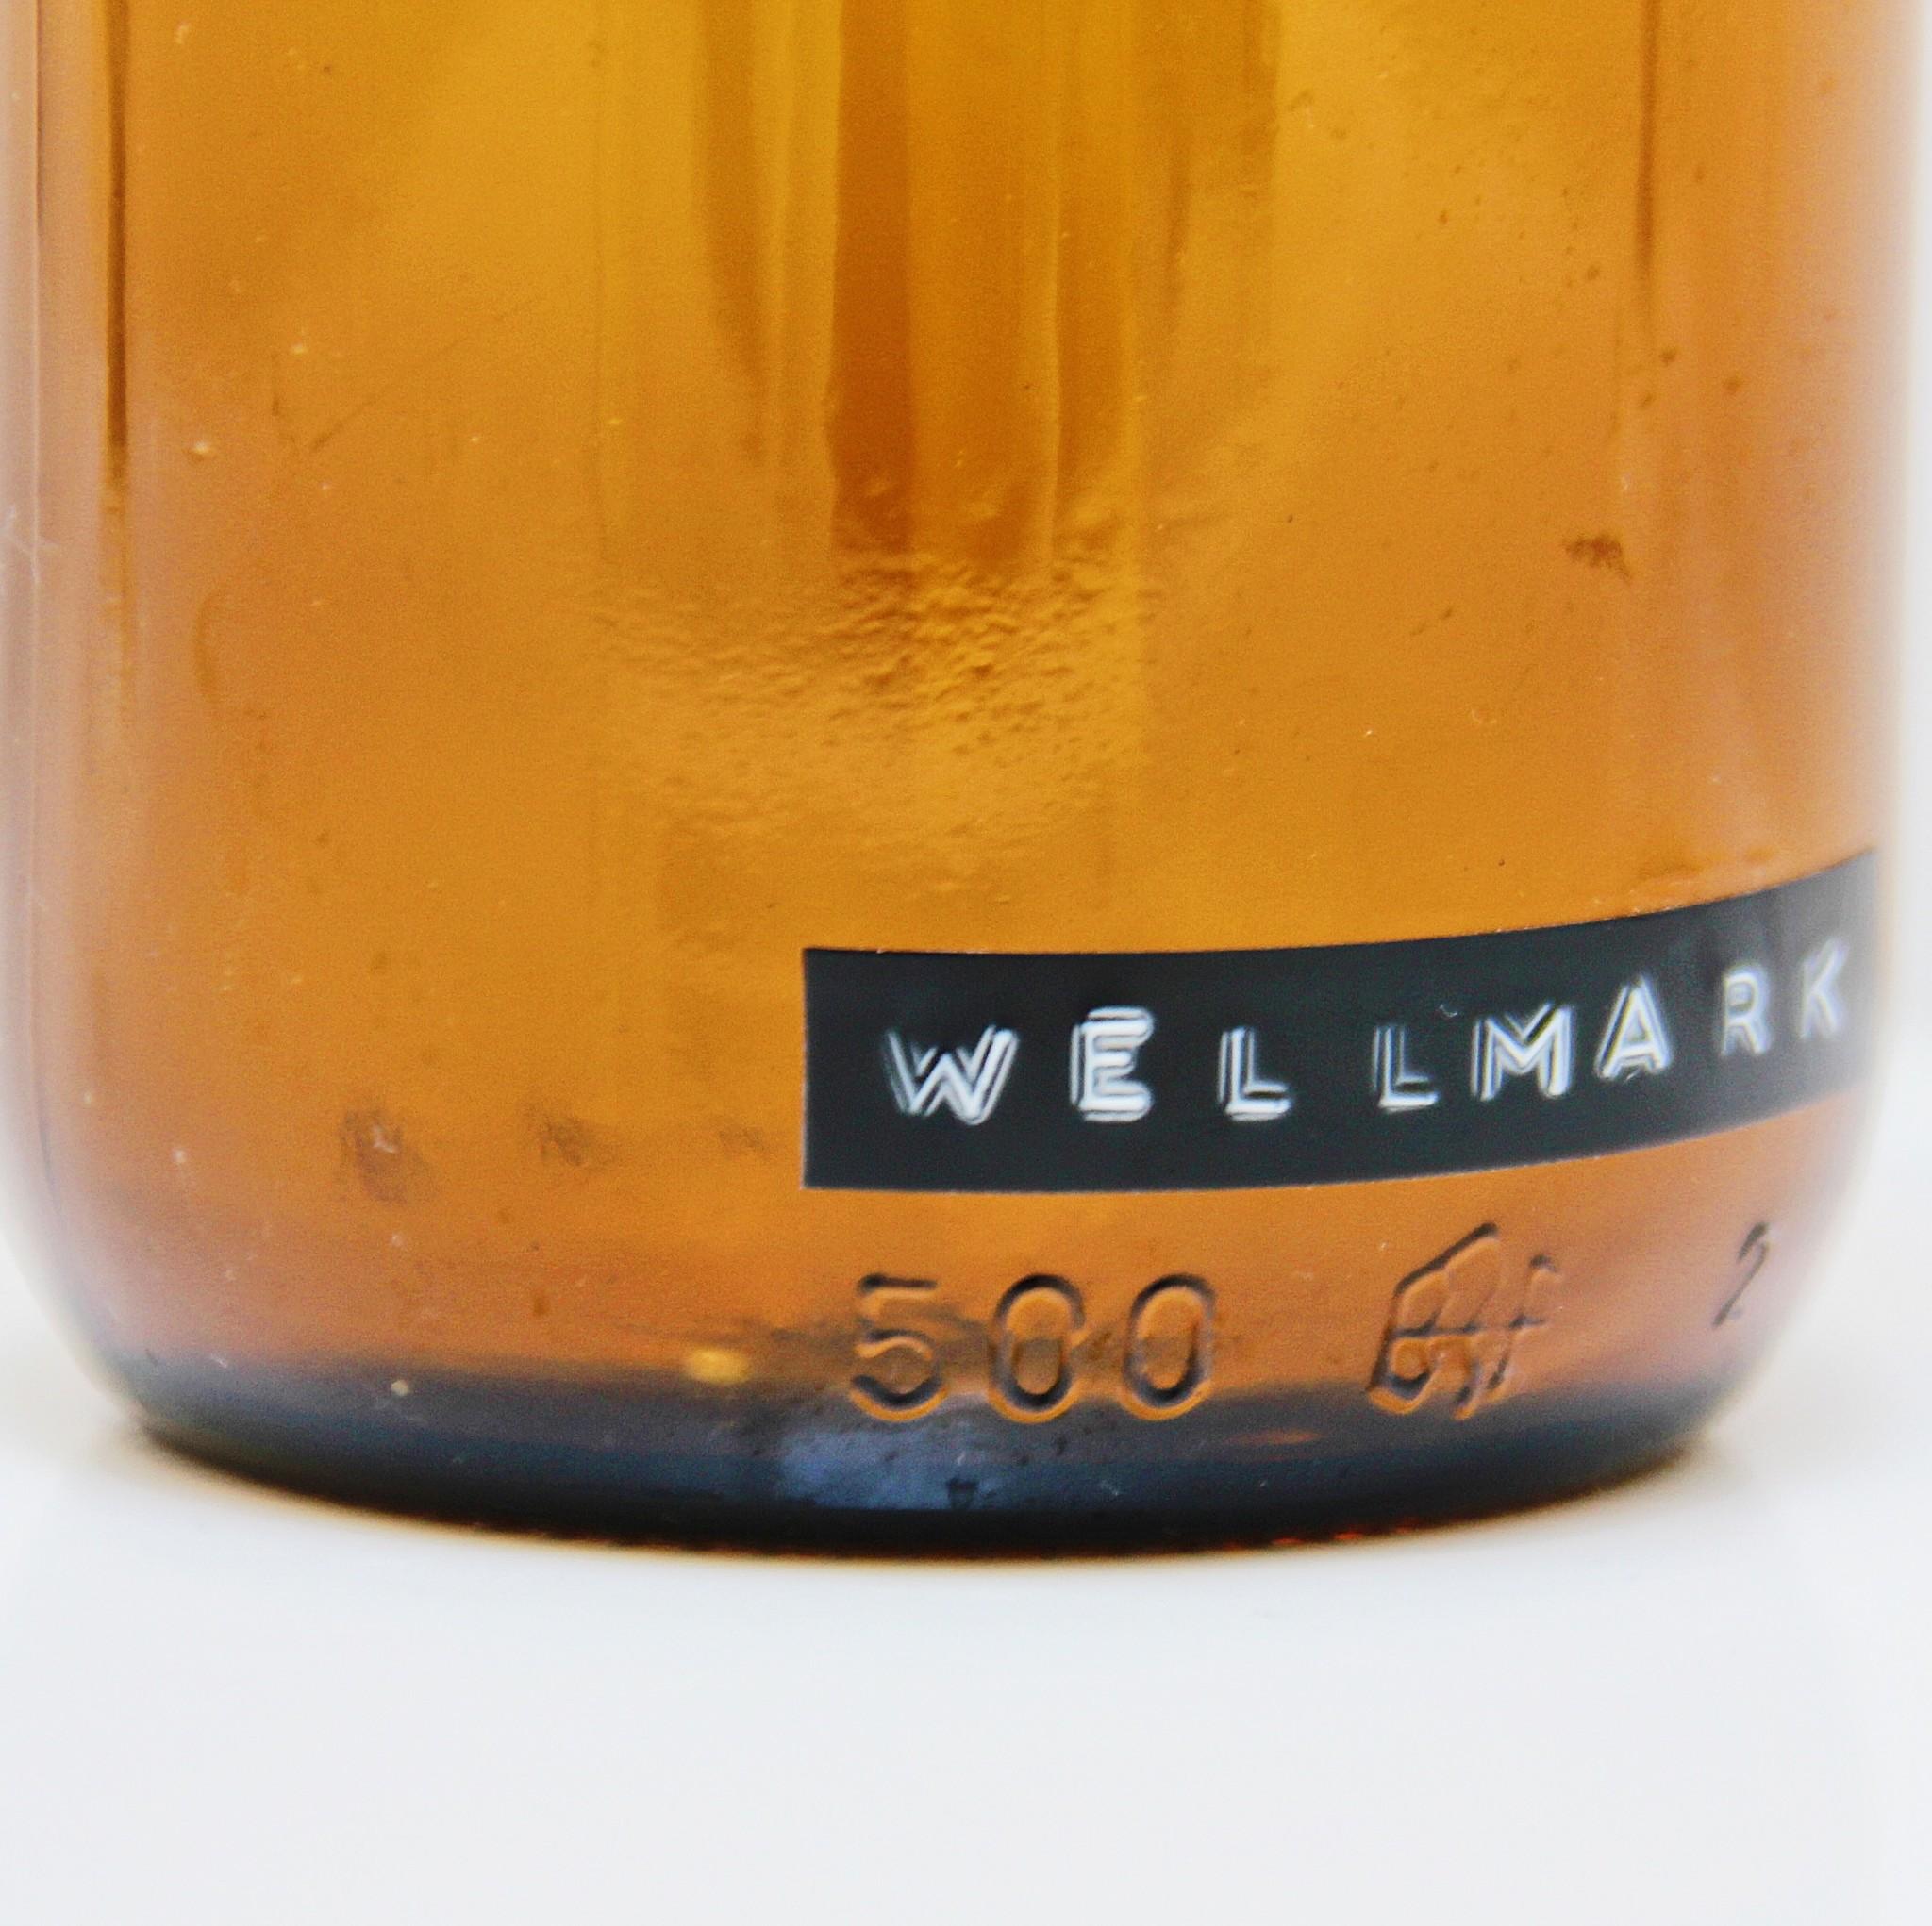 Wellmark Handlotion - zwart - 250 ml